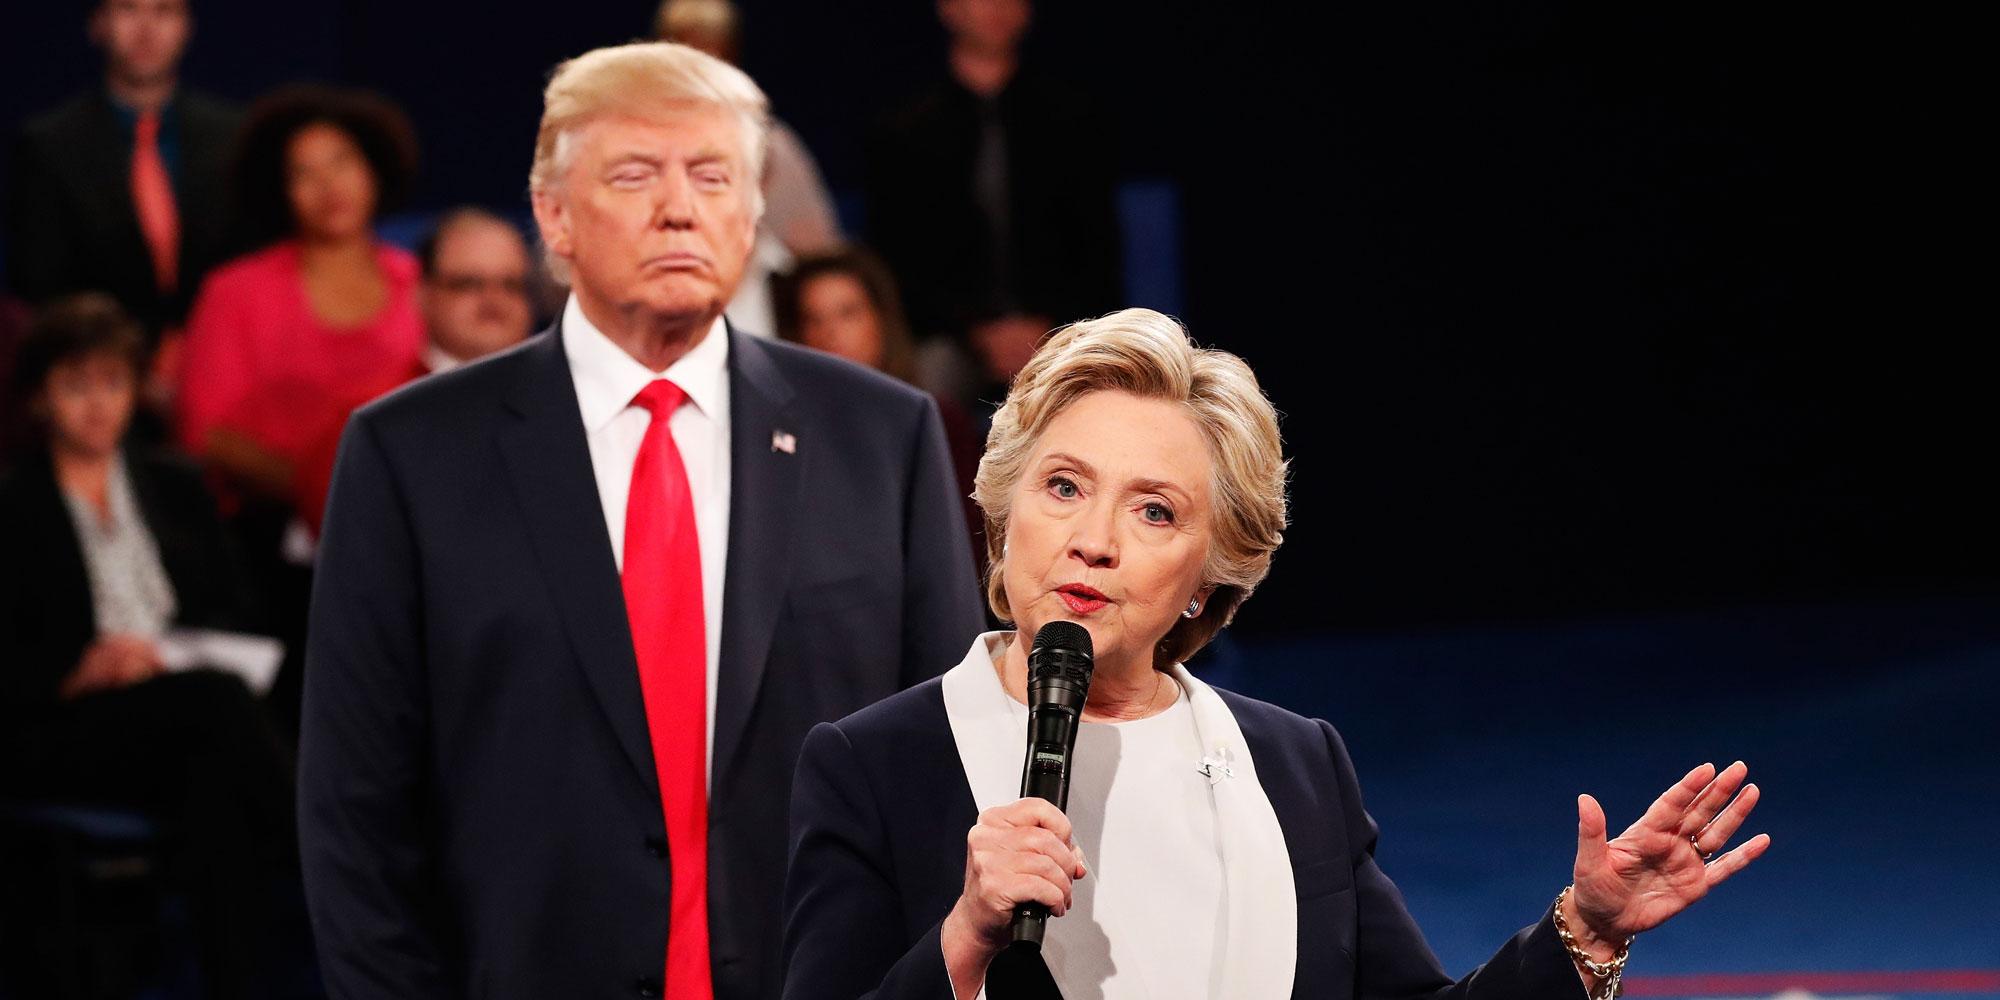 clinton-trump-debate2-1476064278.jpg